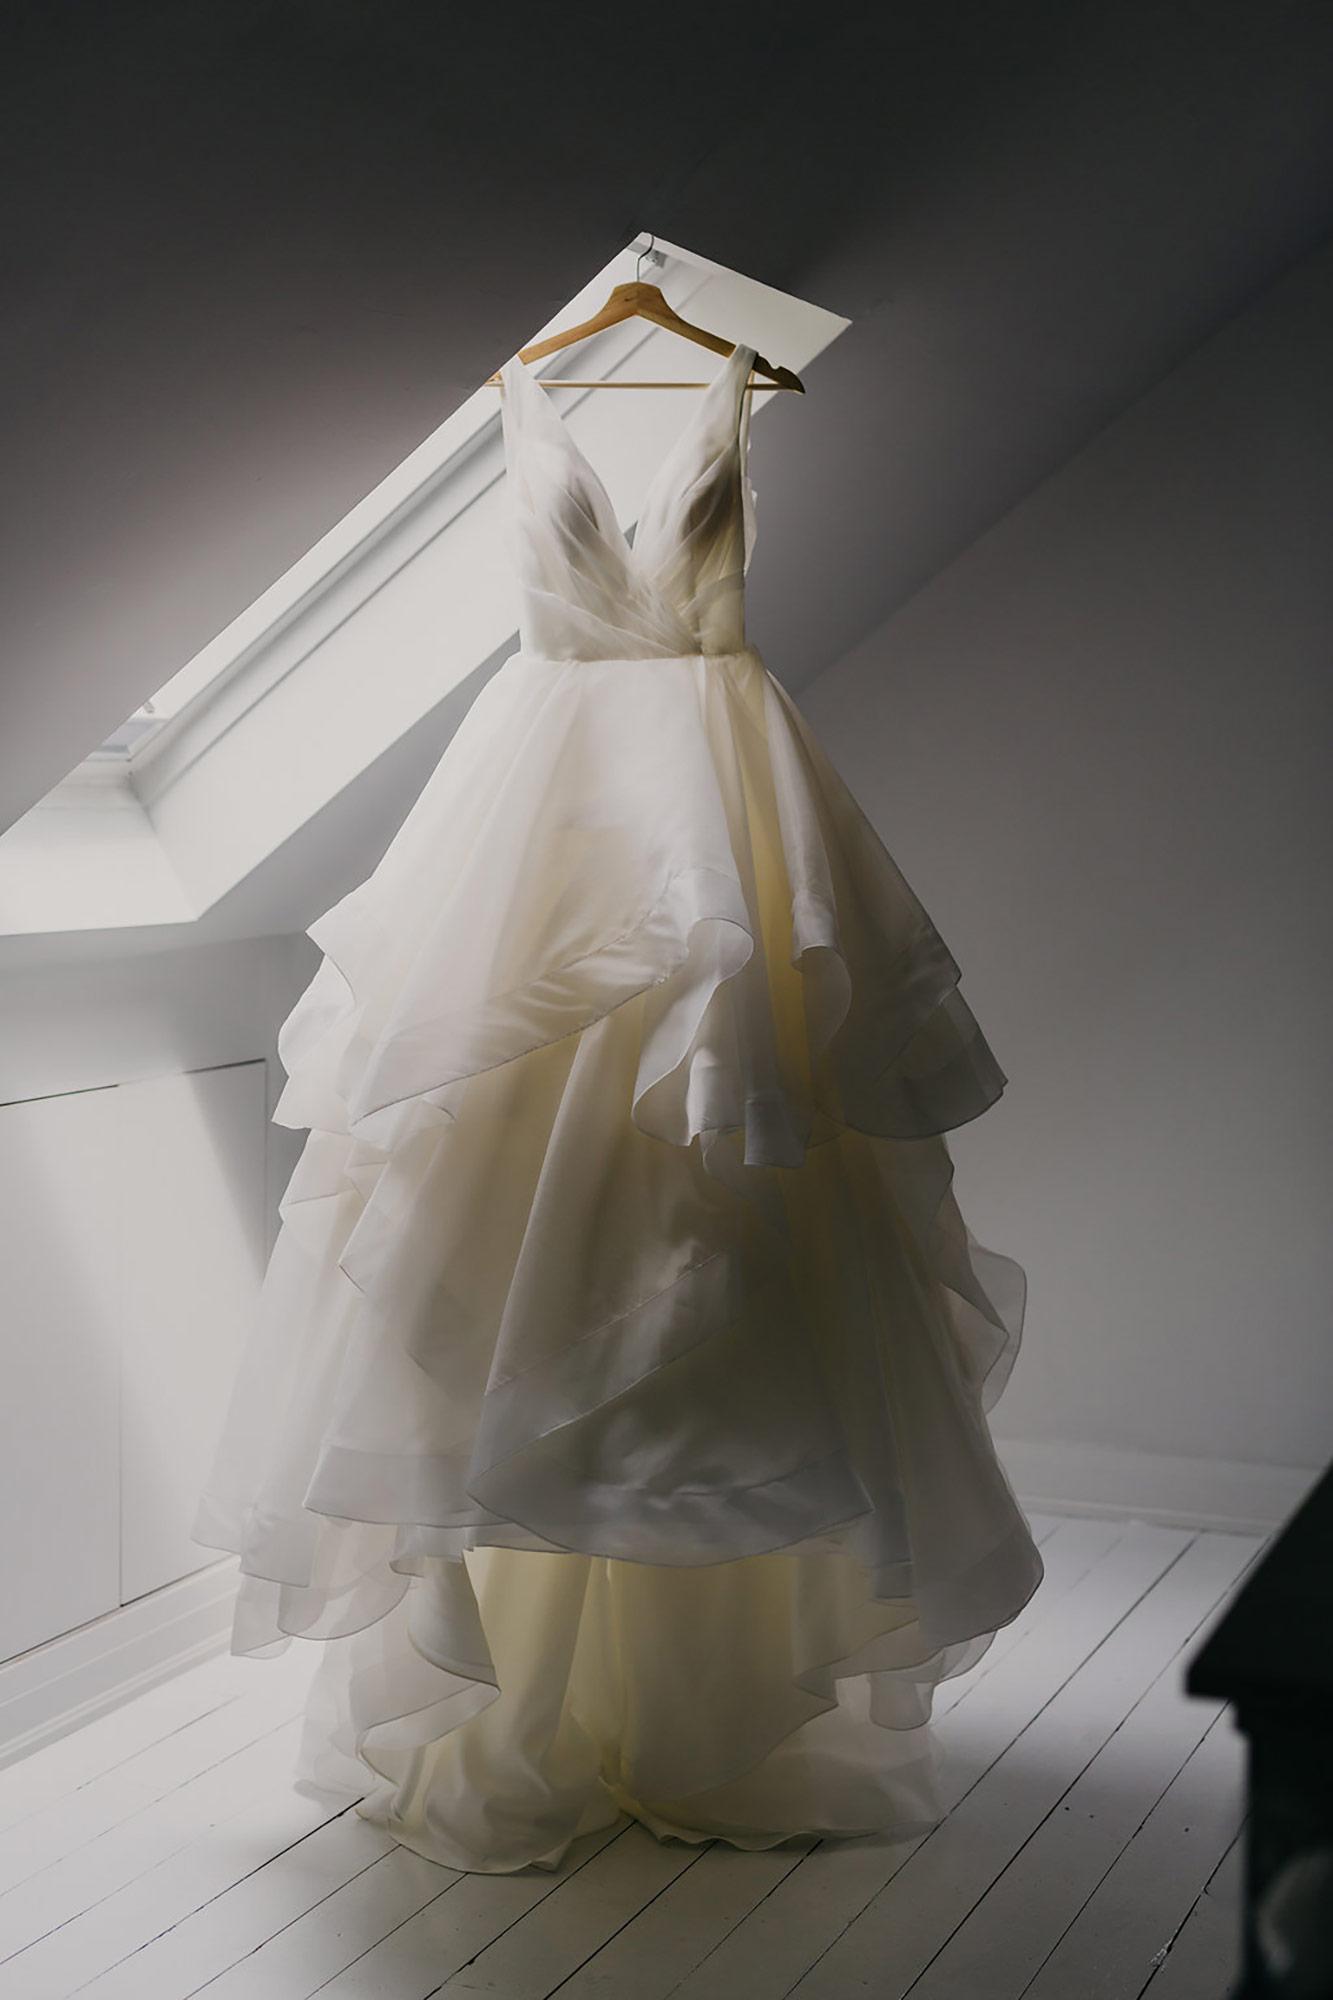 Kurtz-Orchards-Wedding-Niagara-wedding-Vineyard-Bride-Photography-by-Kayla-Rocca-003.JPG